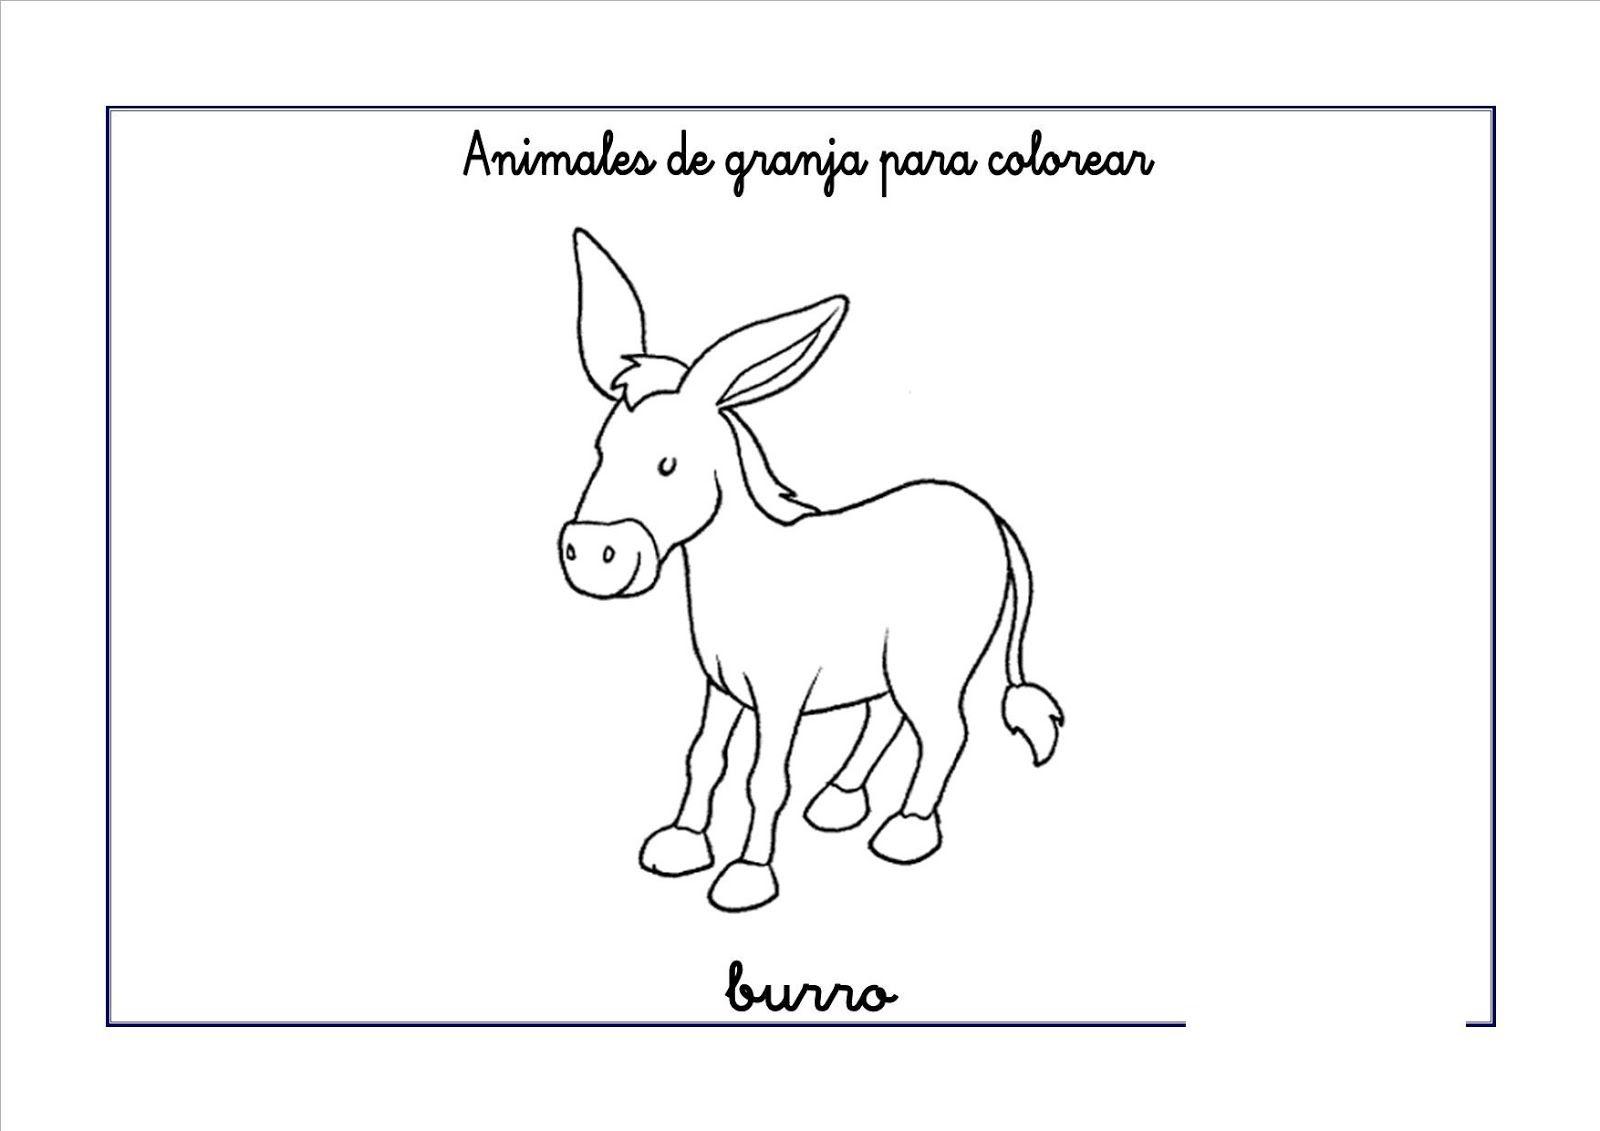 Pin de Cintia Gonzalez en Escolares | Pinterest | Burritos, Animales ...